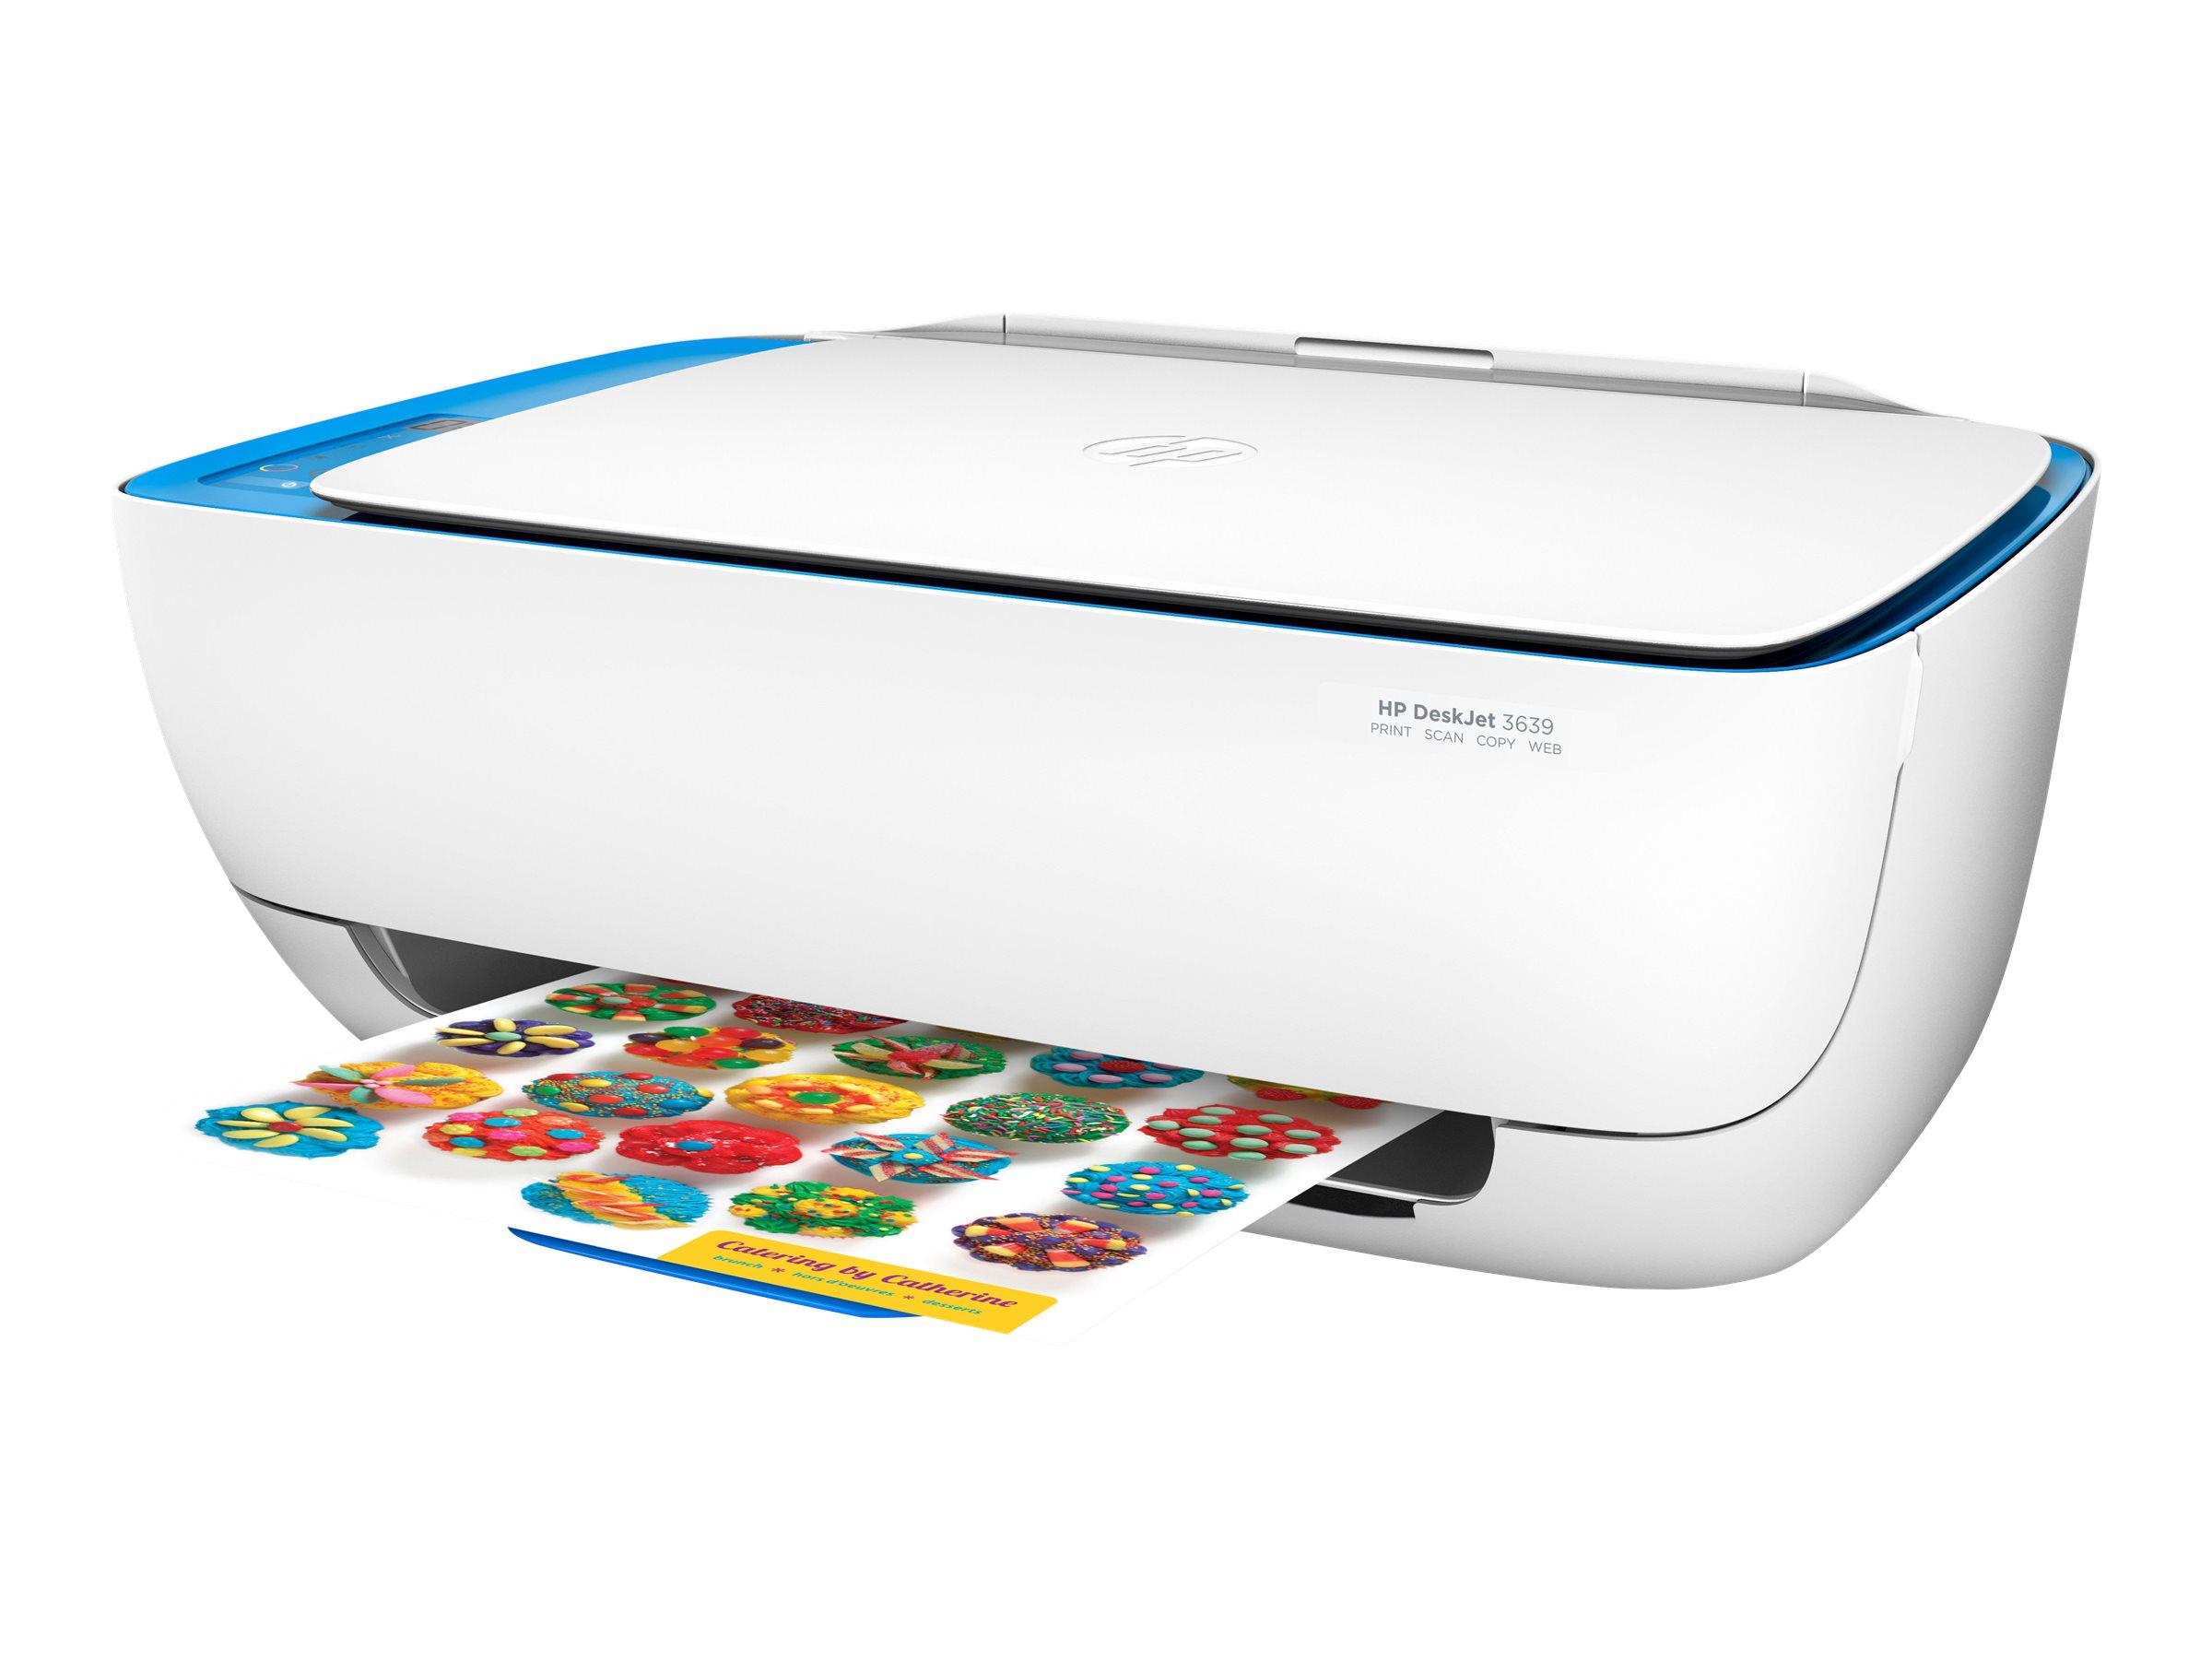 HP Deskjet 3639 All-in-One - imprimante multifonctions jet d'encre couleur A4 - Wifi, USB